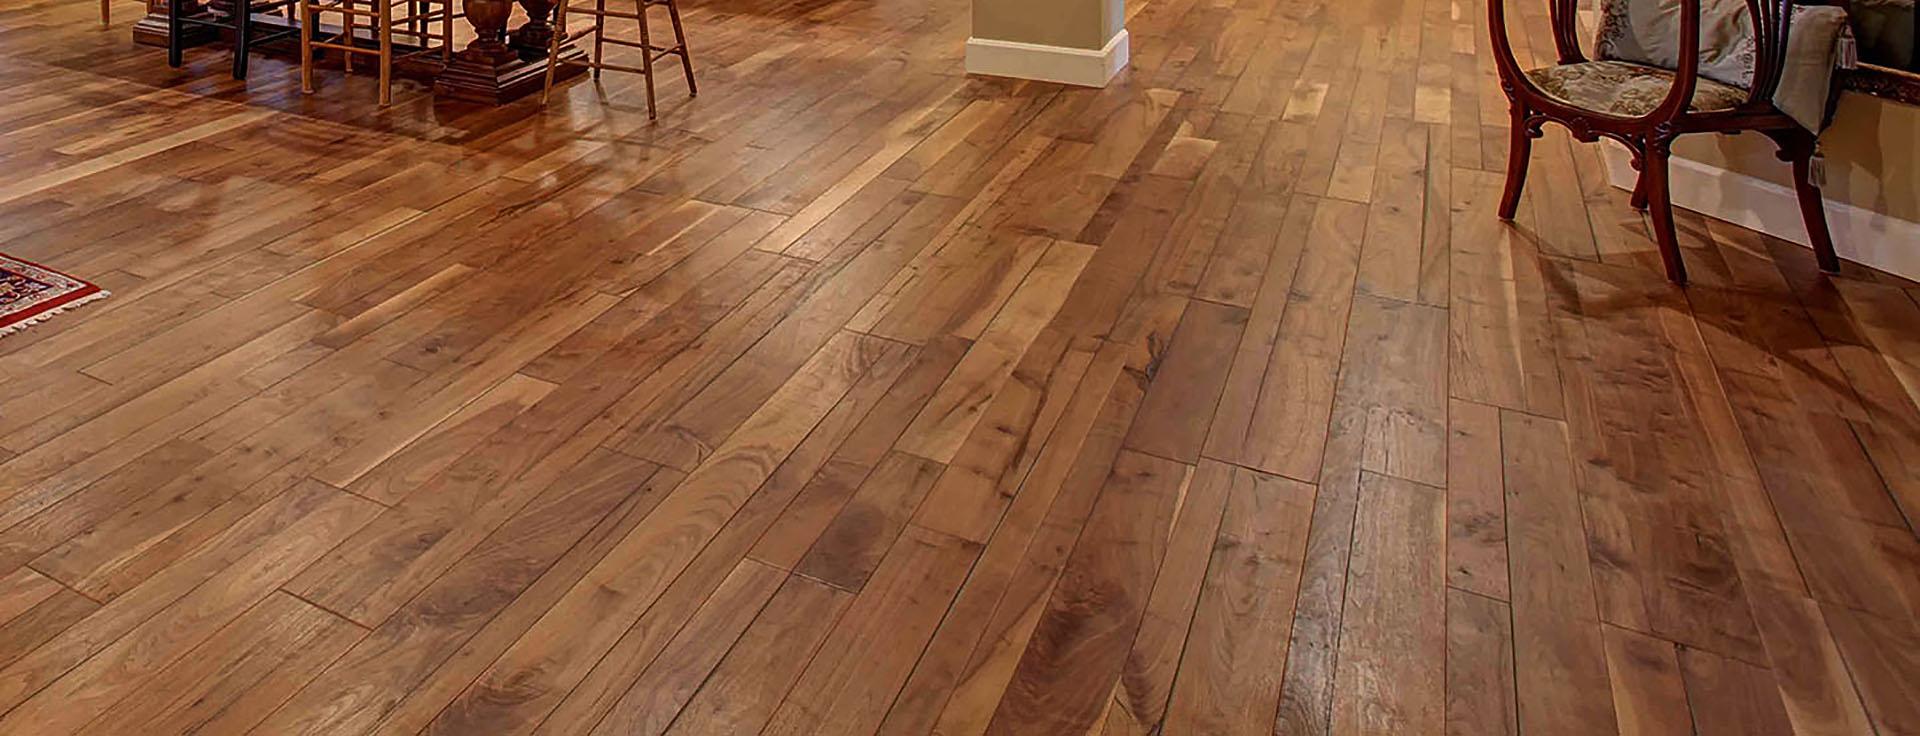 Hardwood Flooring Installation And Refinishing Company In